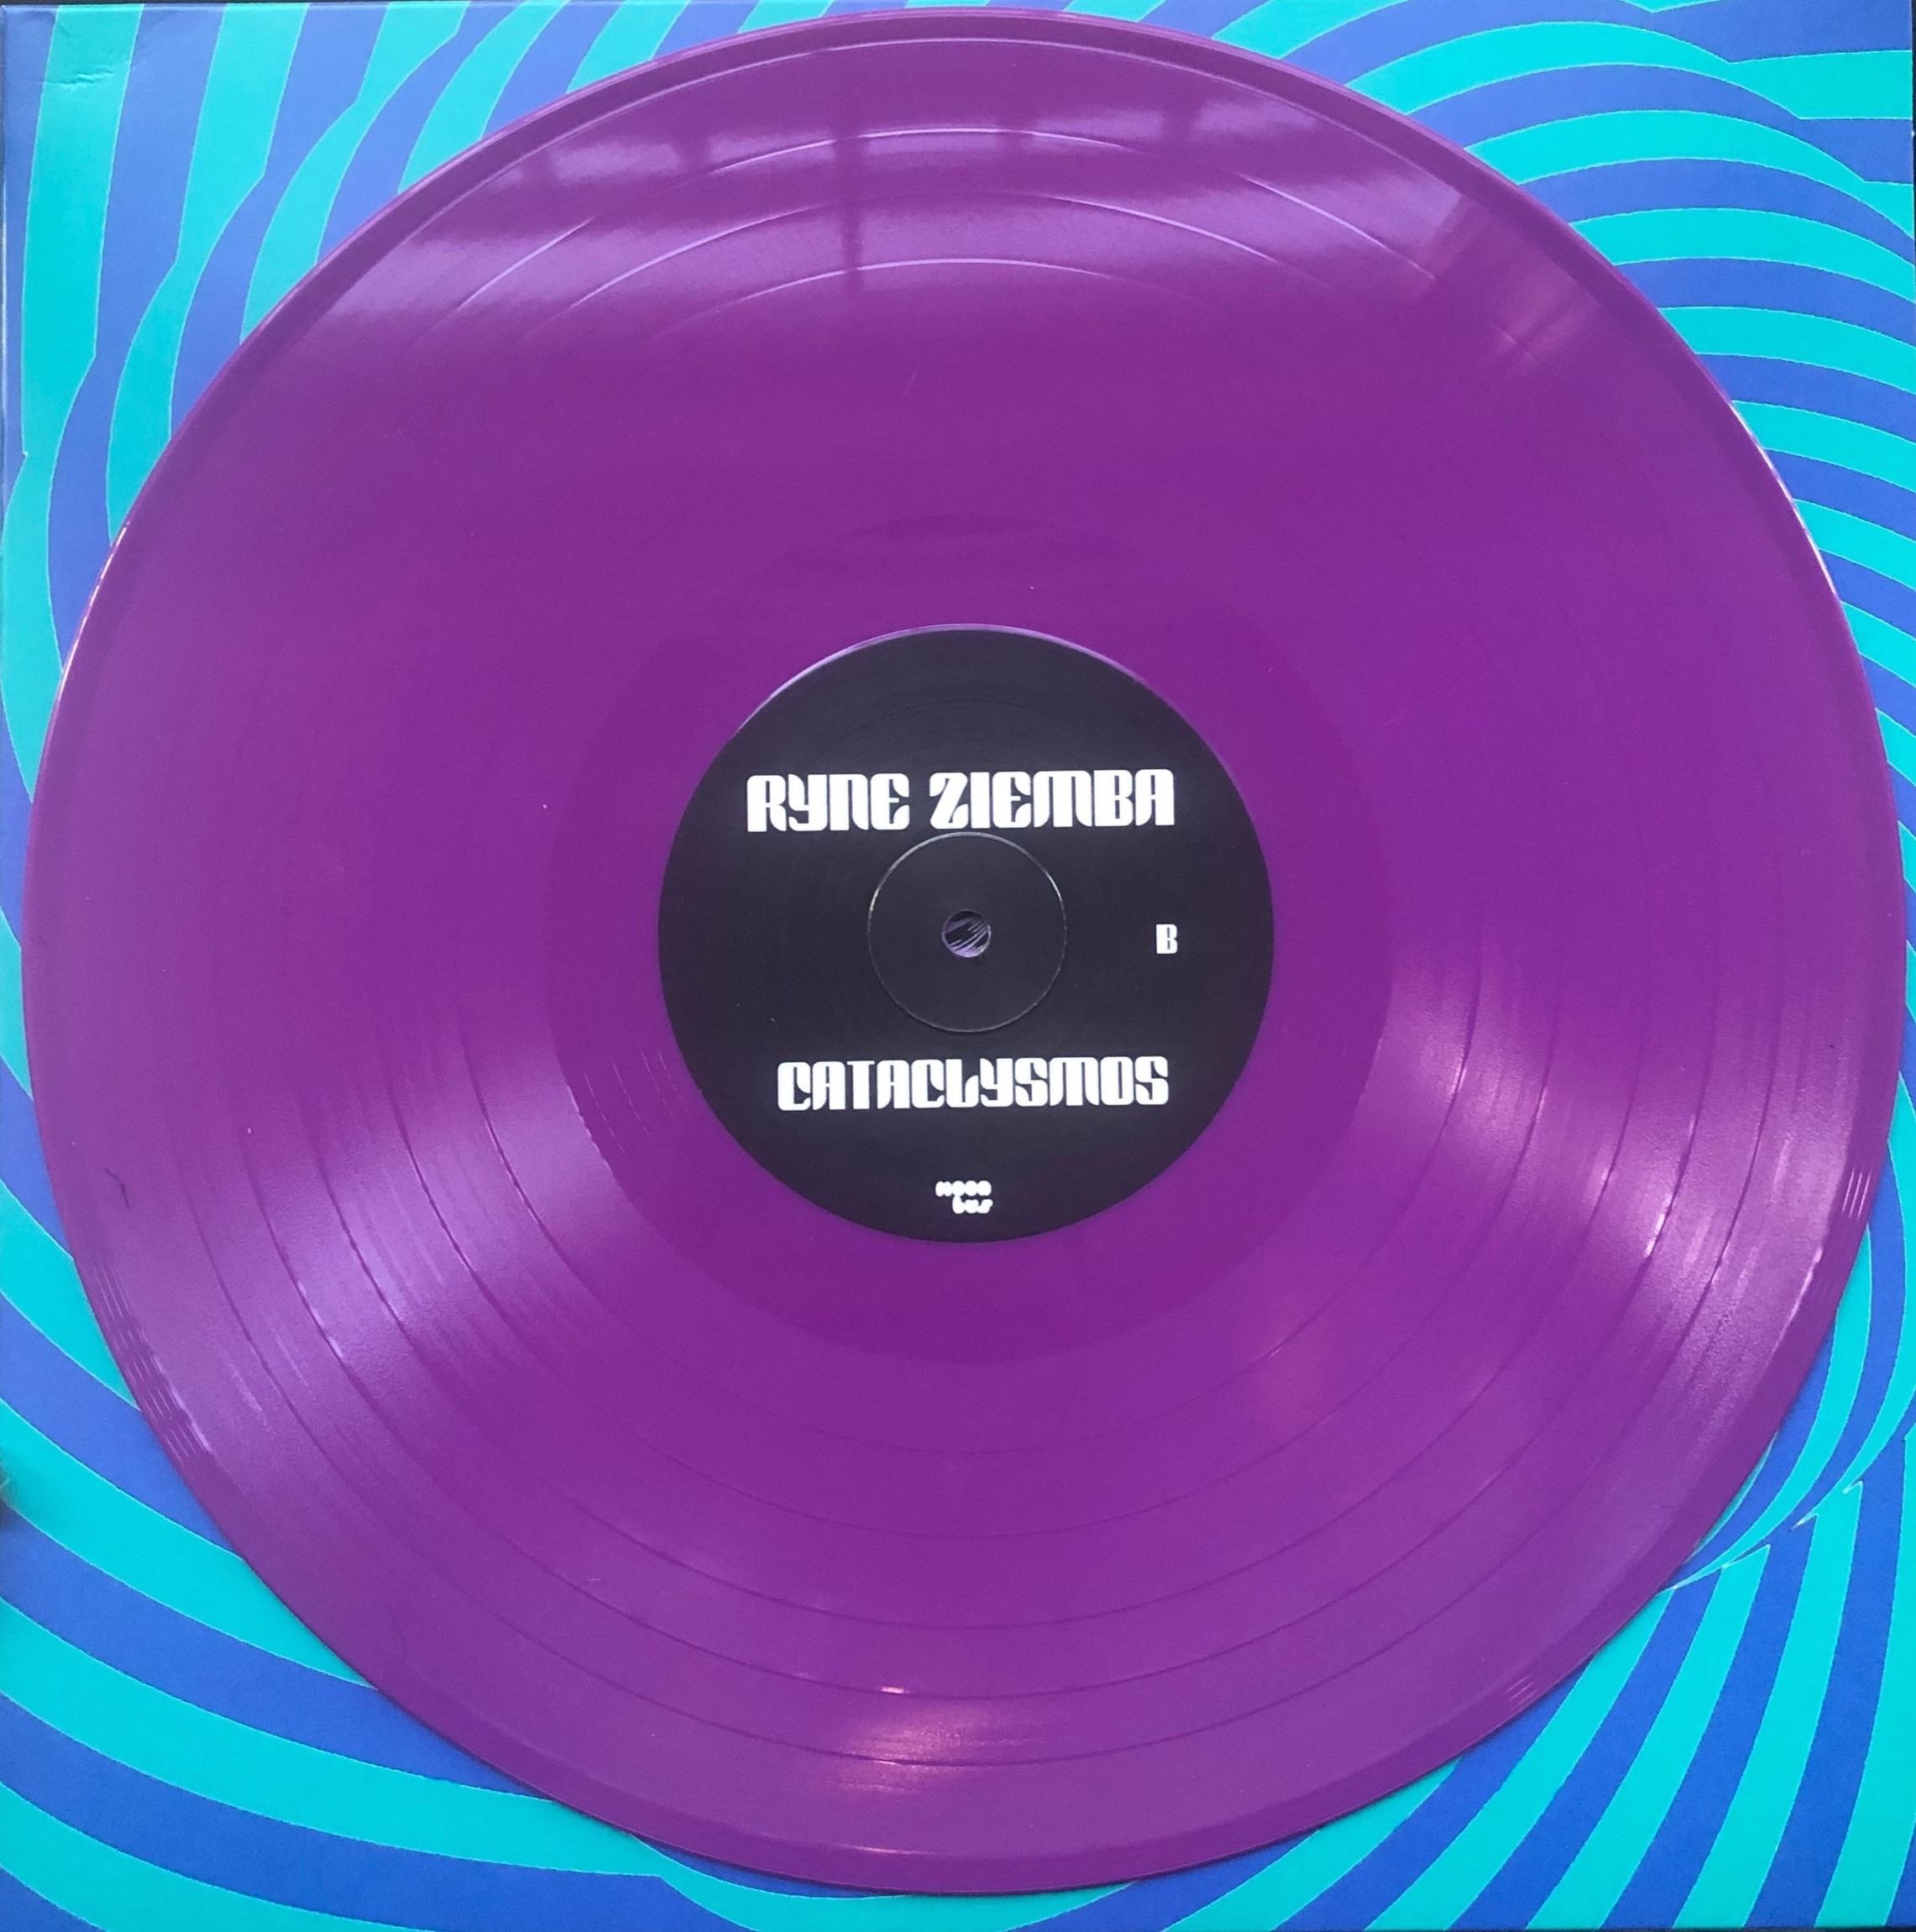 Cataclysmos-purple+viny.jpg